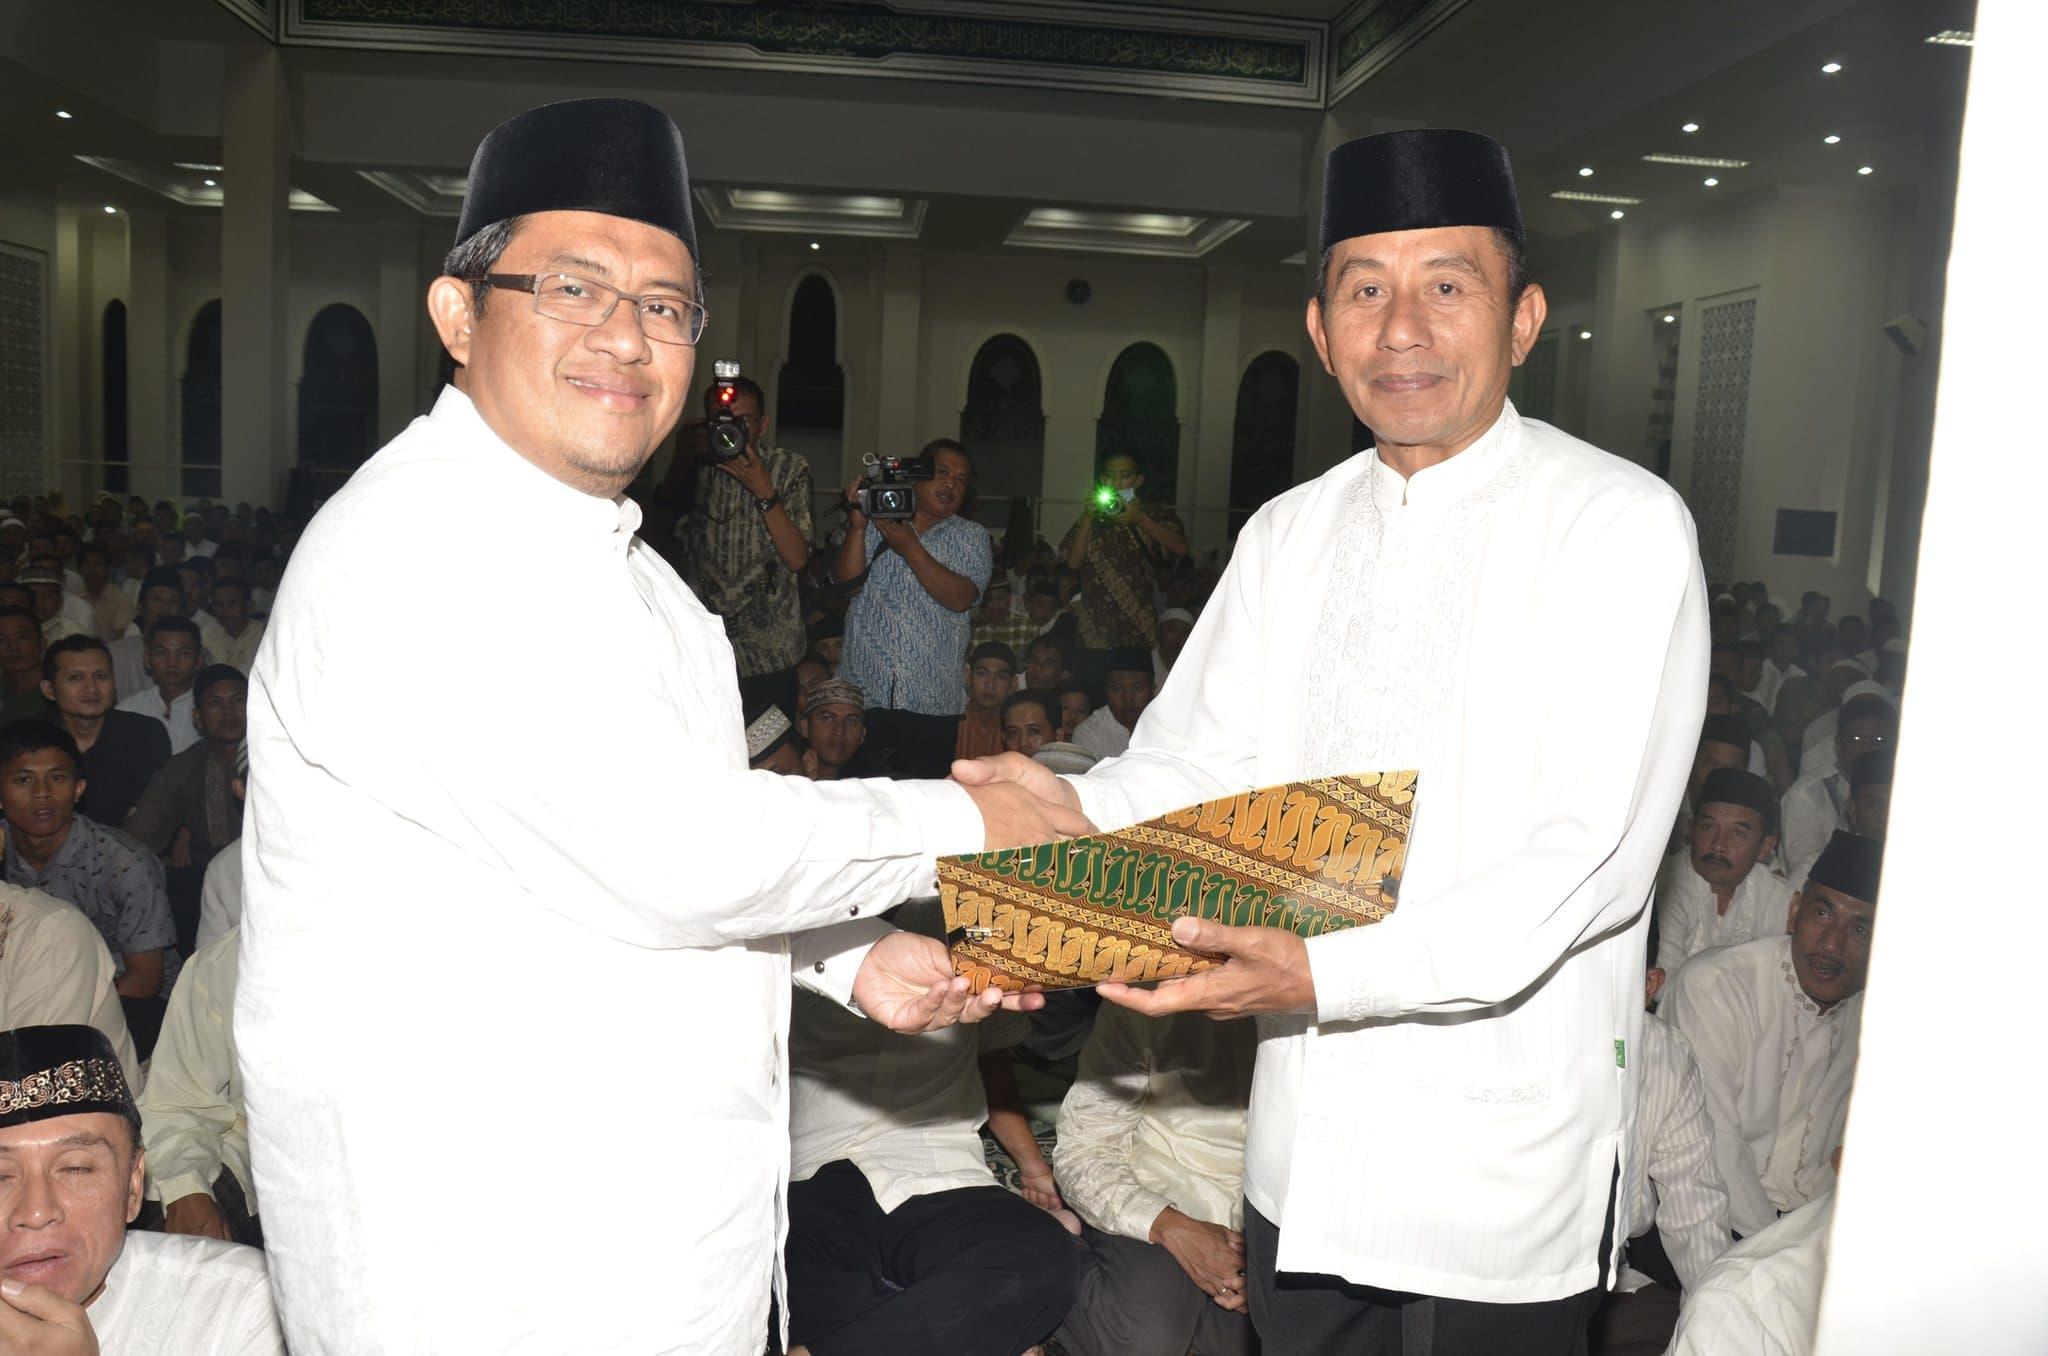 Pangdam III/Slw Shalat Tarawih Bersama Forkopimda Jabar di Mesjid Al-Ikhlas.